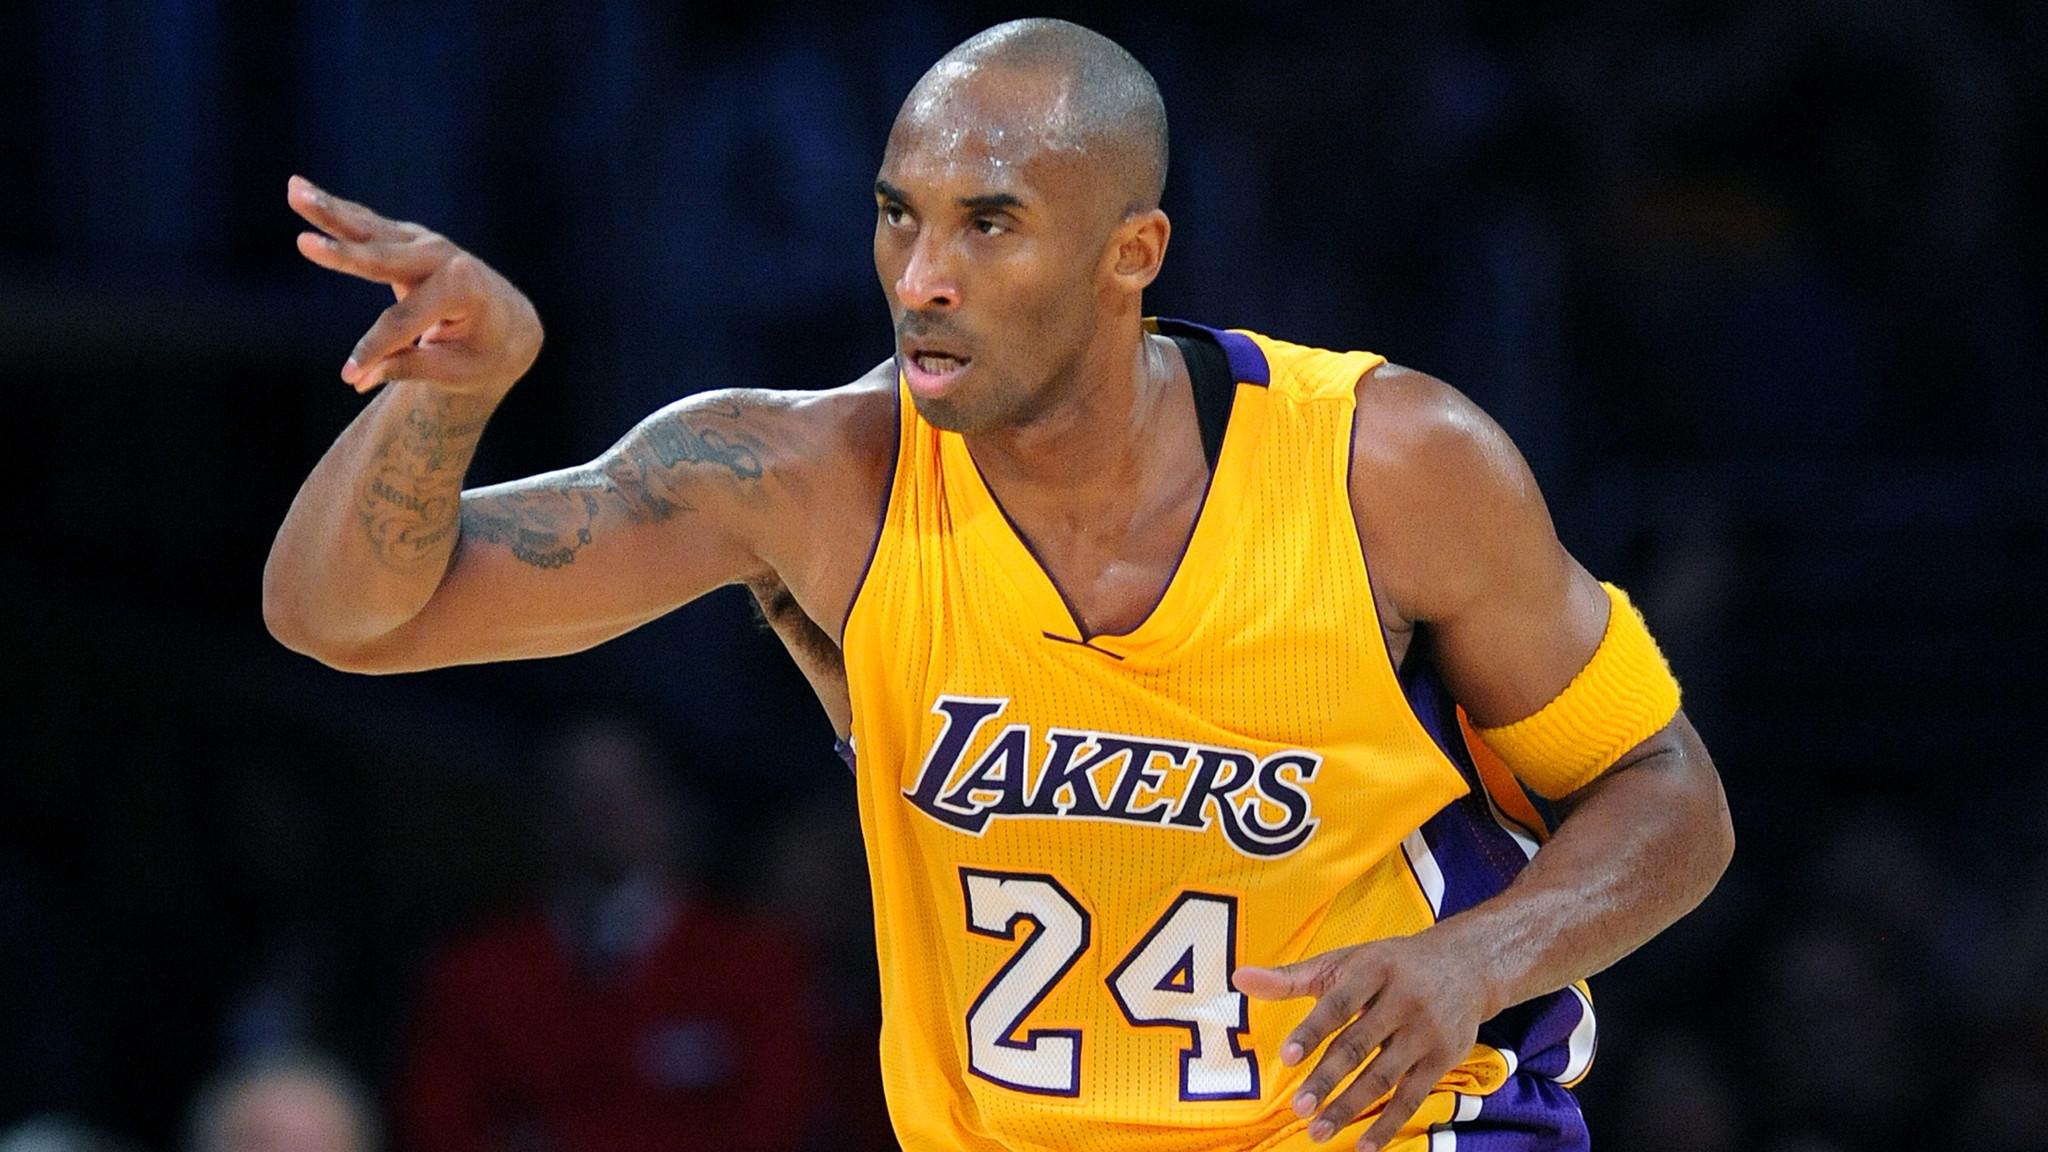 Kobe Bryant Free HD Wallpapers